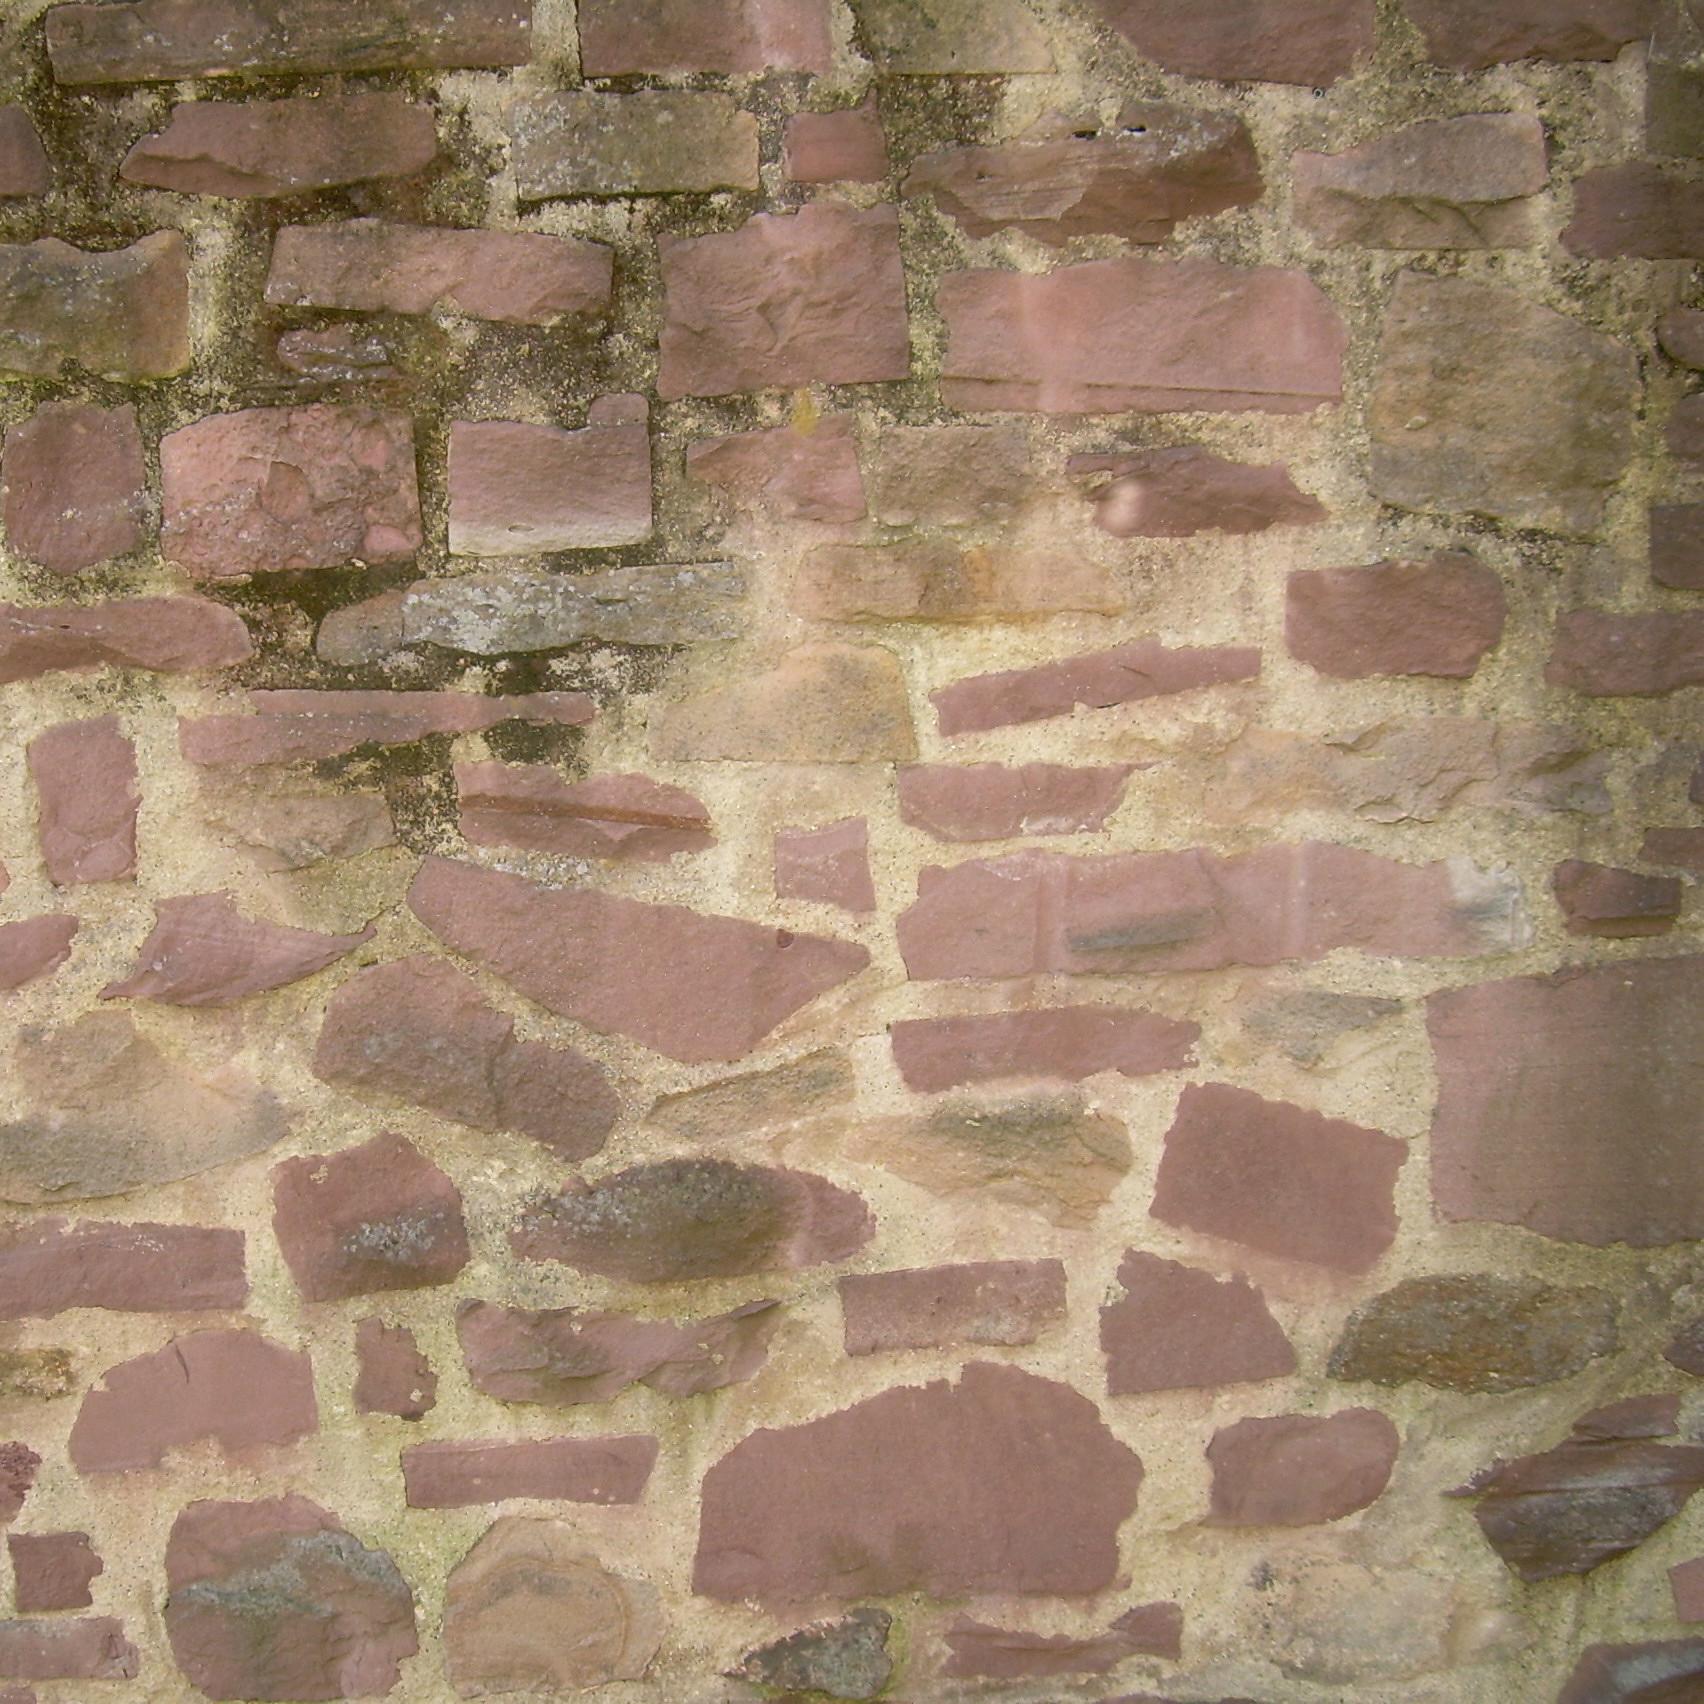 Textur wall dirty